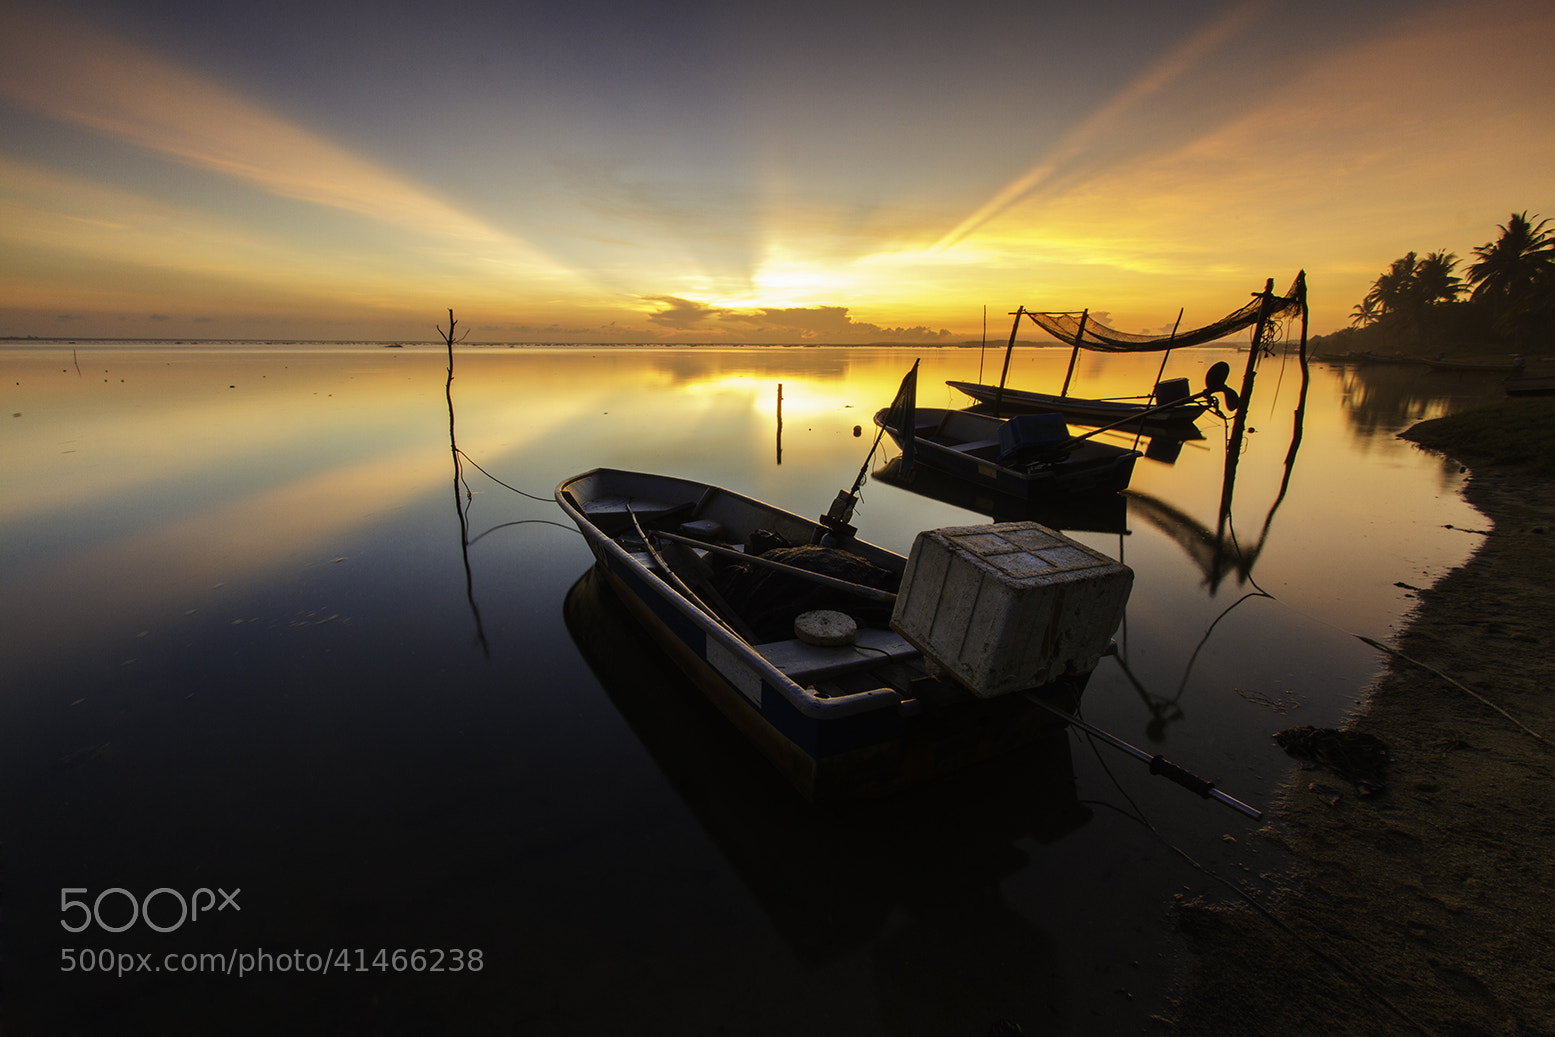 Photograph The Beginning by Reza Redzuan on 500px